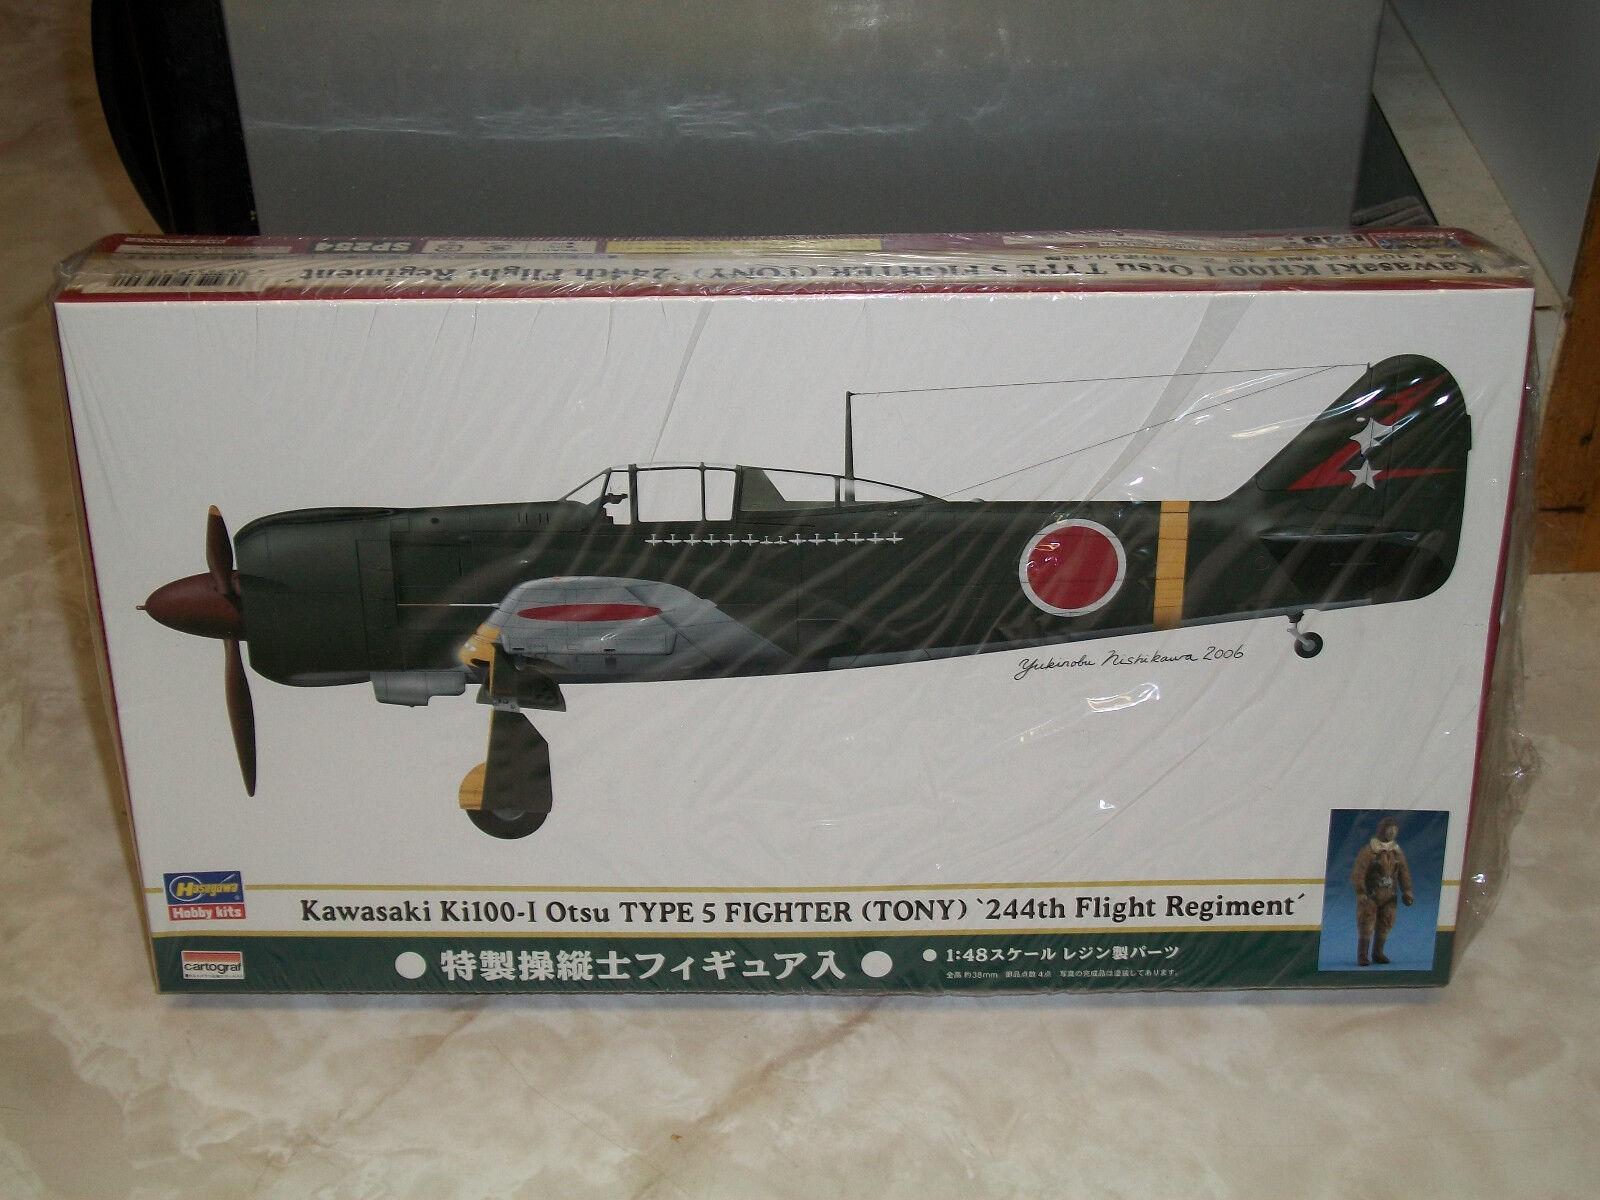 Hasegawa 1 48 Kawasaki Ki100-I Otsu Type 5 (Tony) '244th Flight Regt' - Sealed